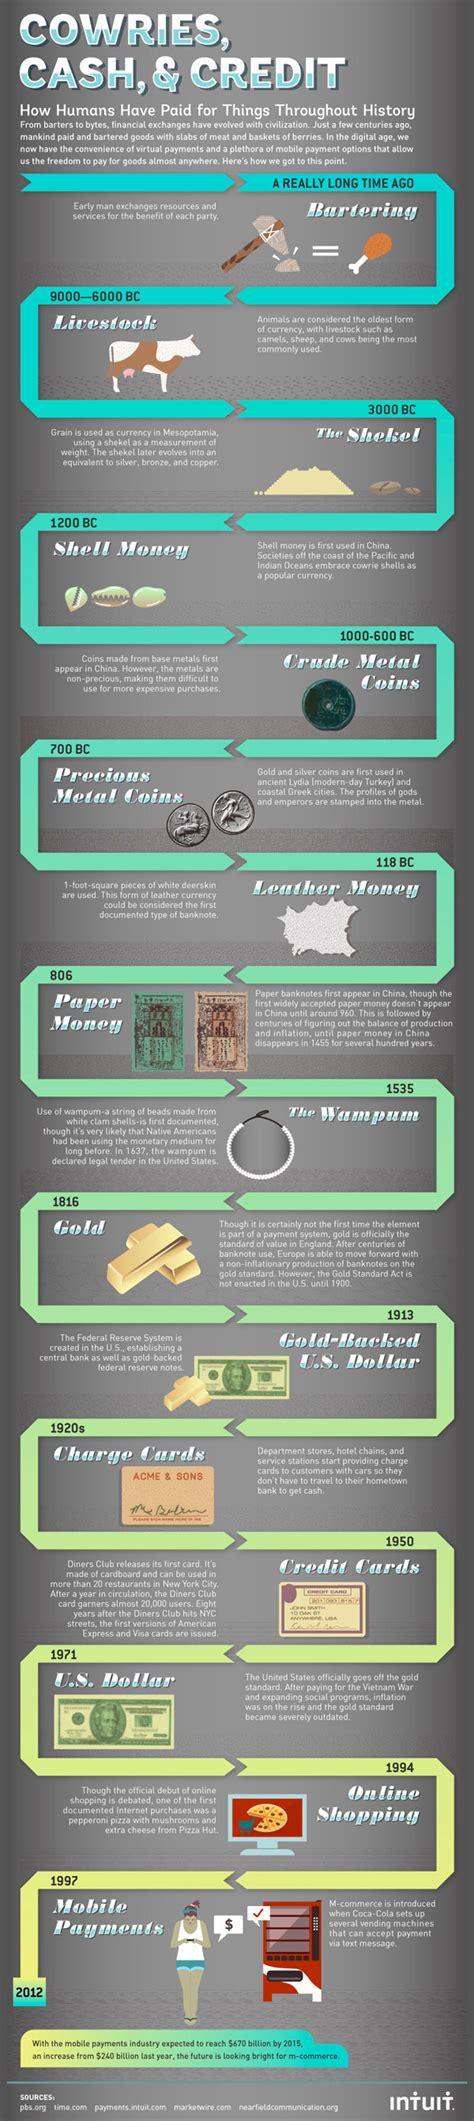 Money evolution timeline - iNFOGRAPHiCs MANiA